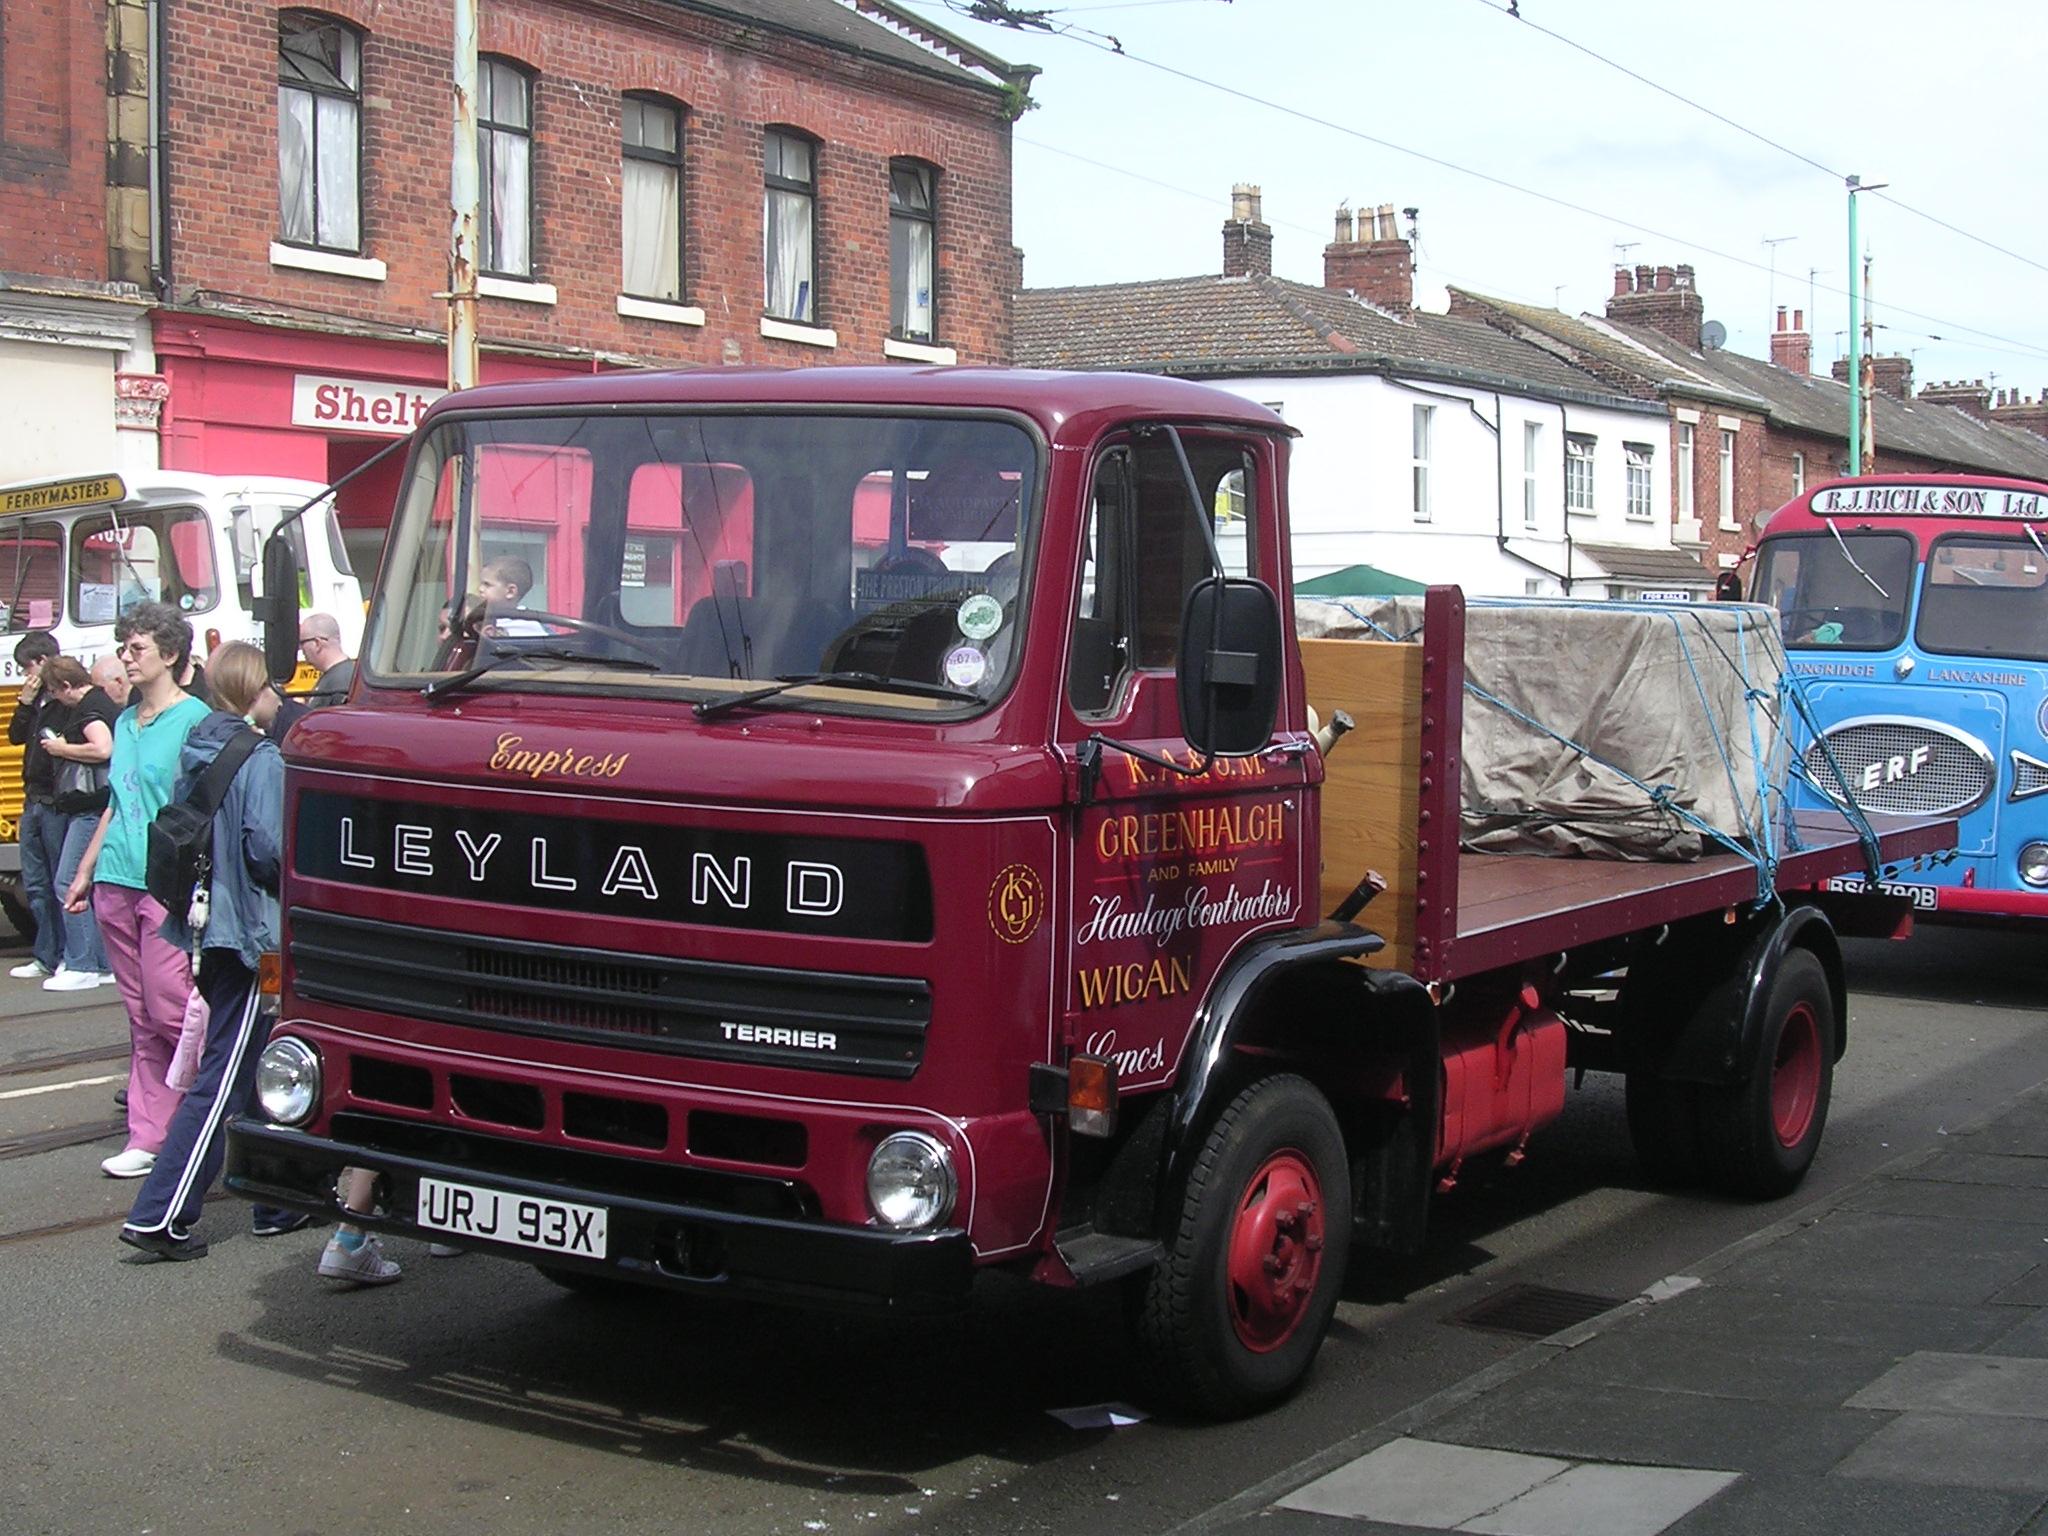 File:Leyland Terrier truck.jpg - Wikimedia Commons